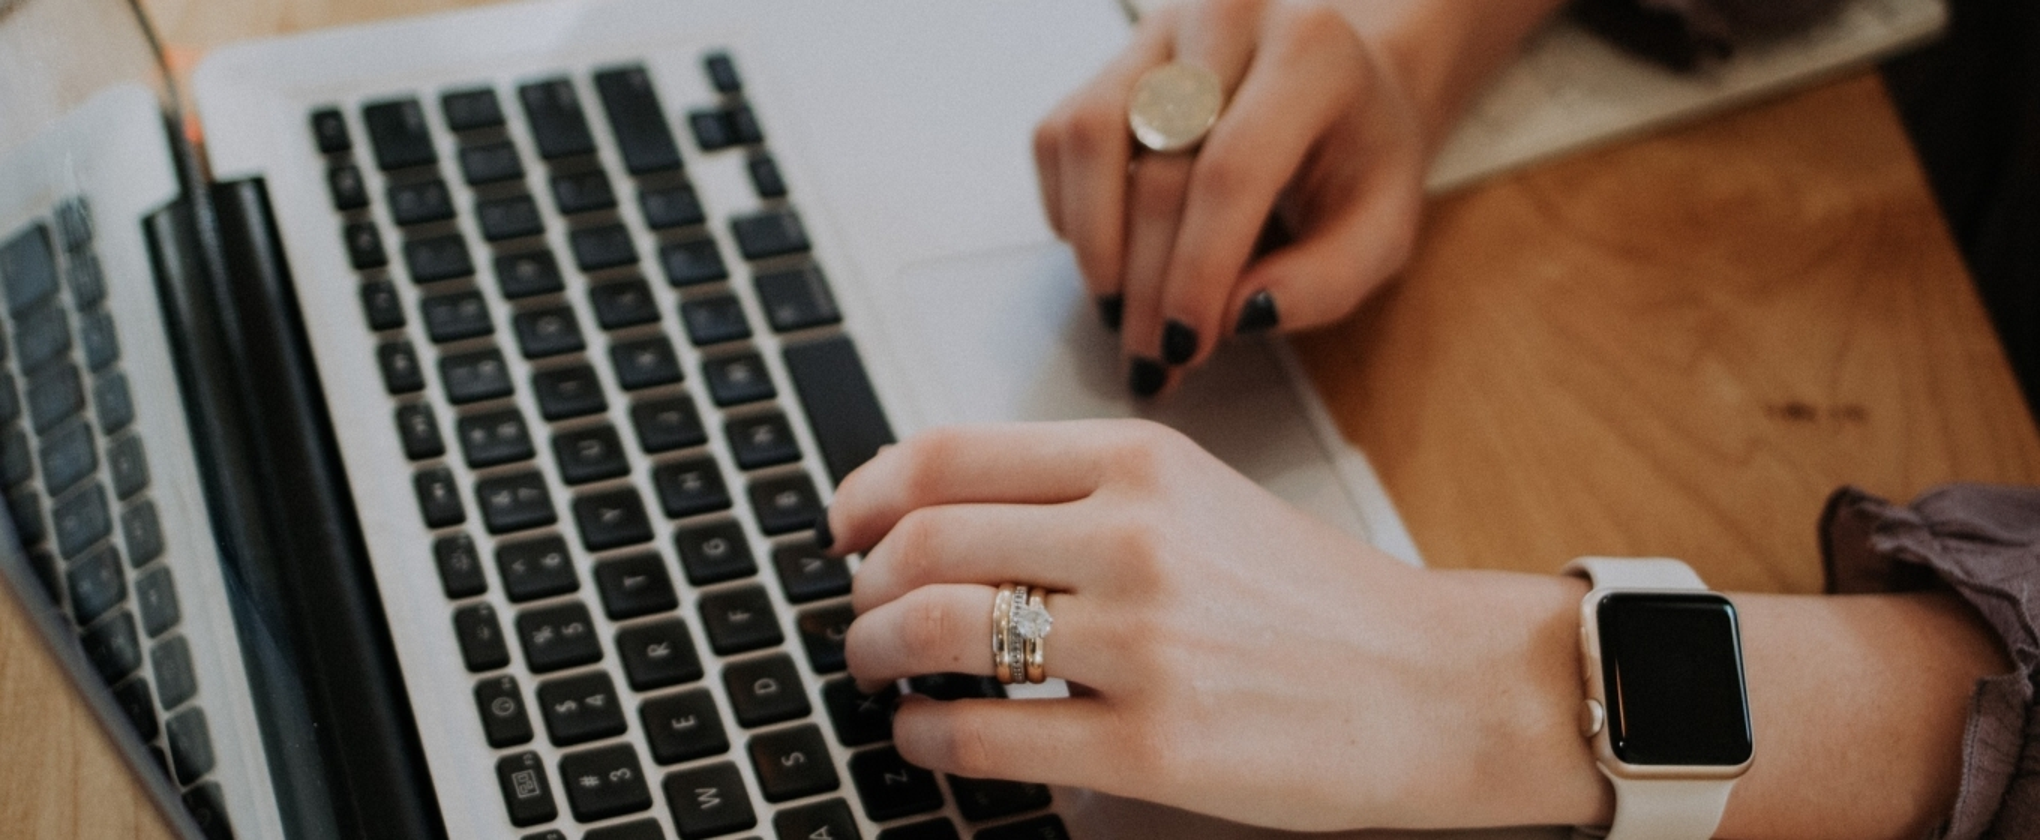 Trademark Registration Isn't Everlasting